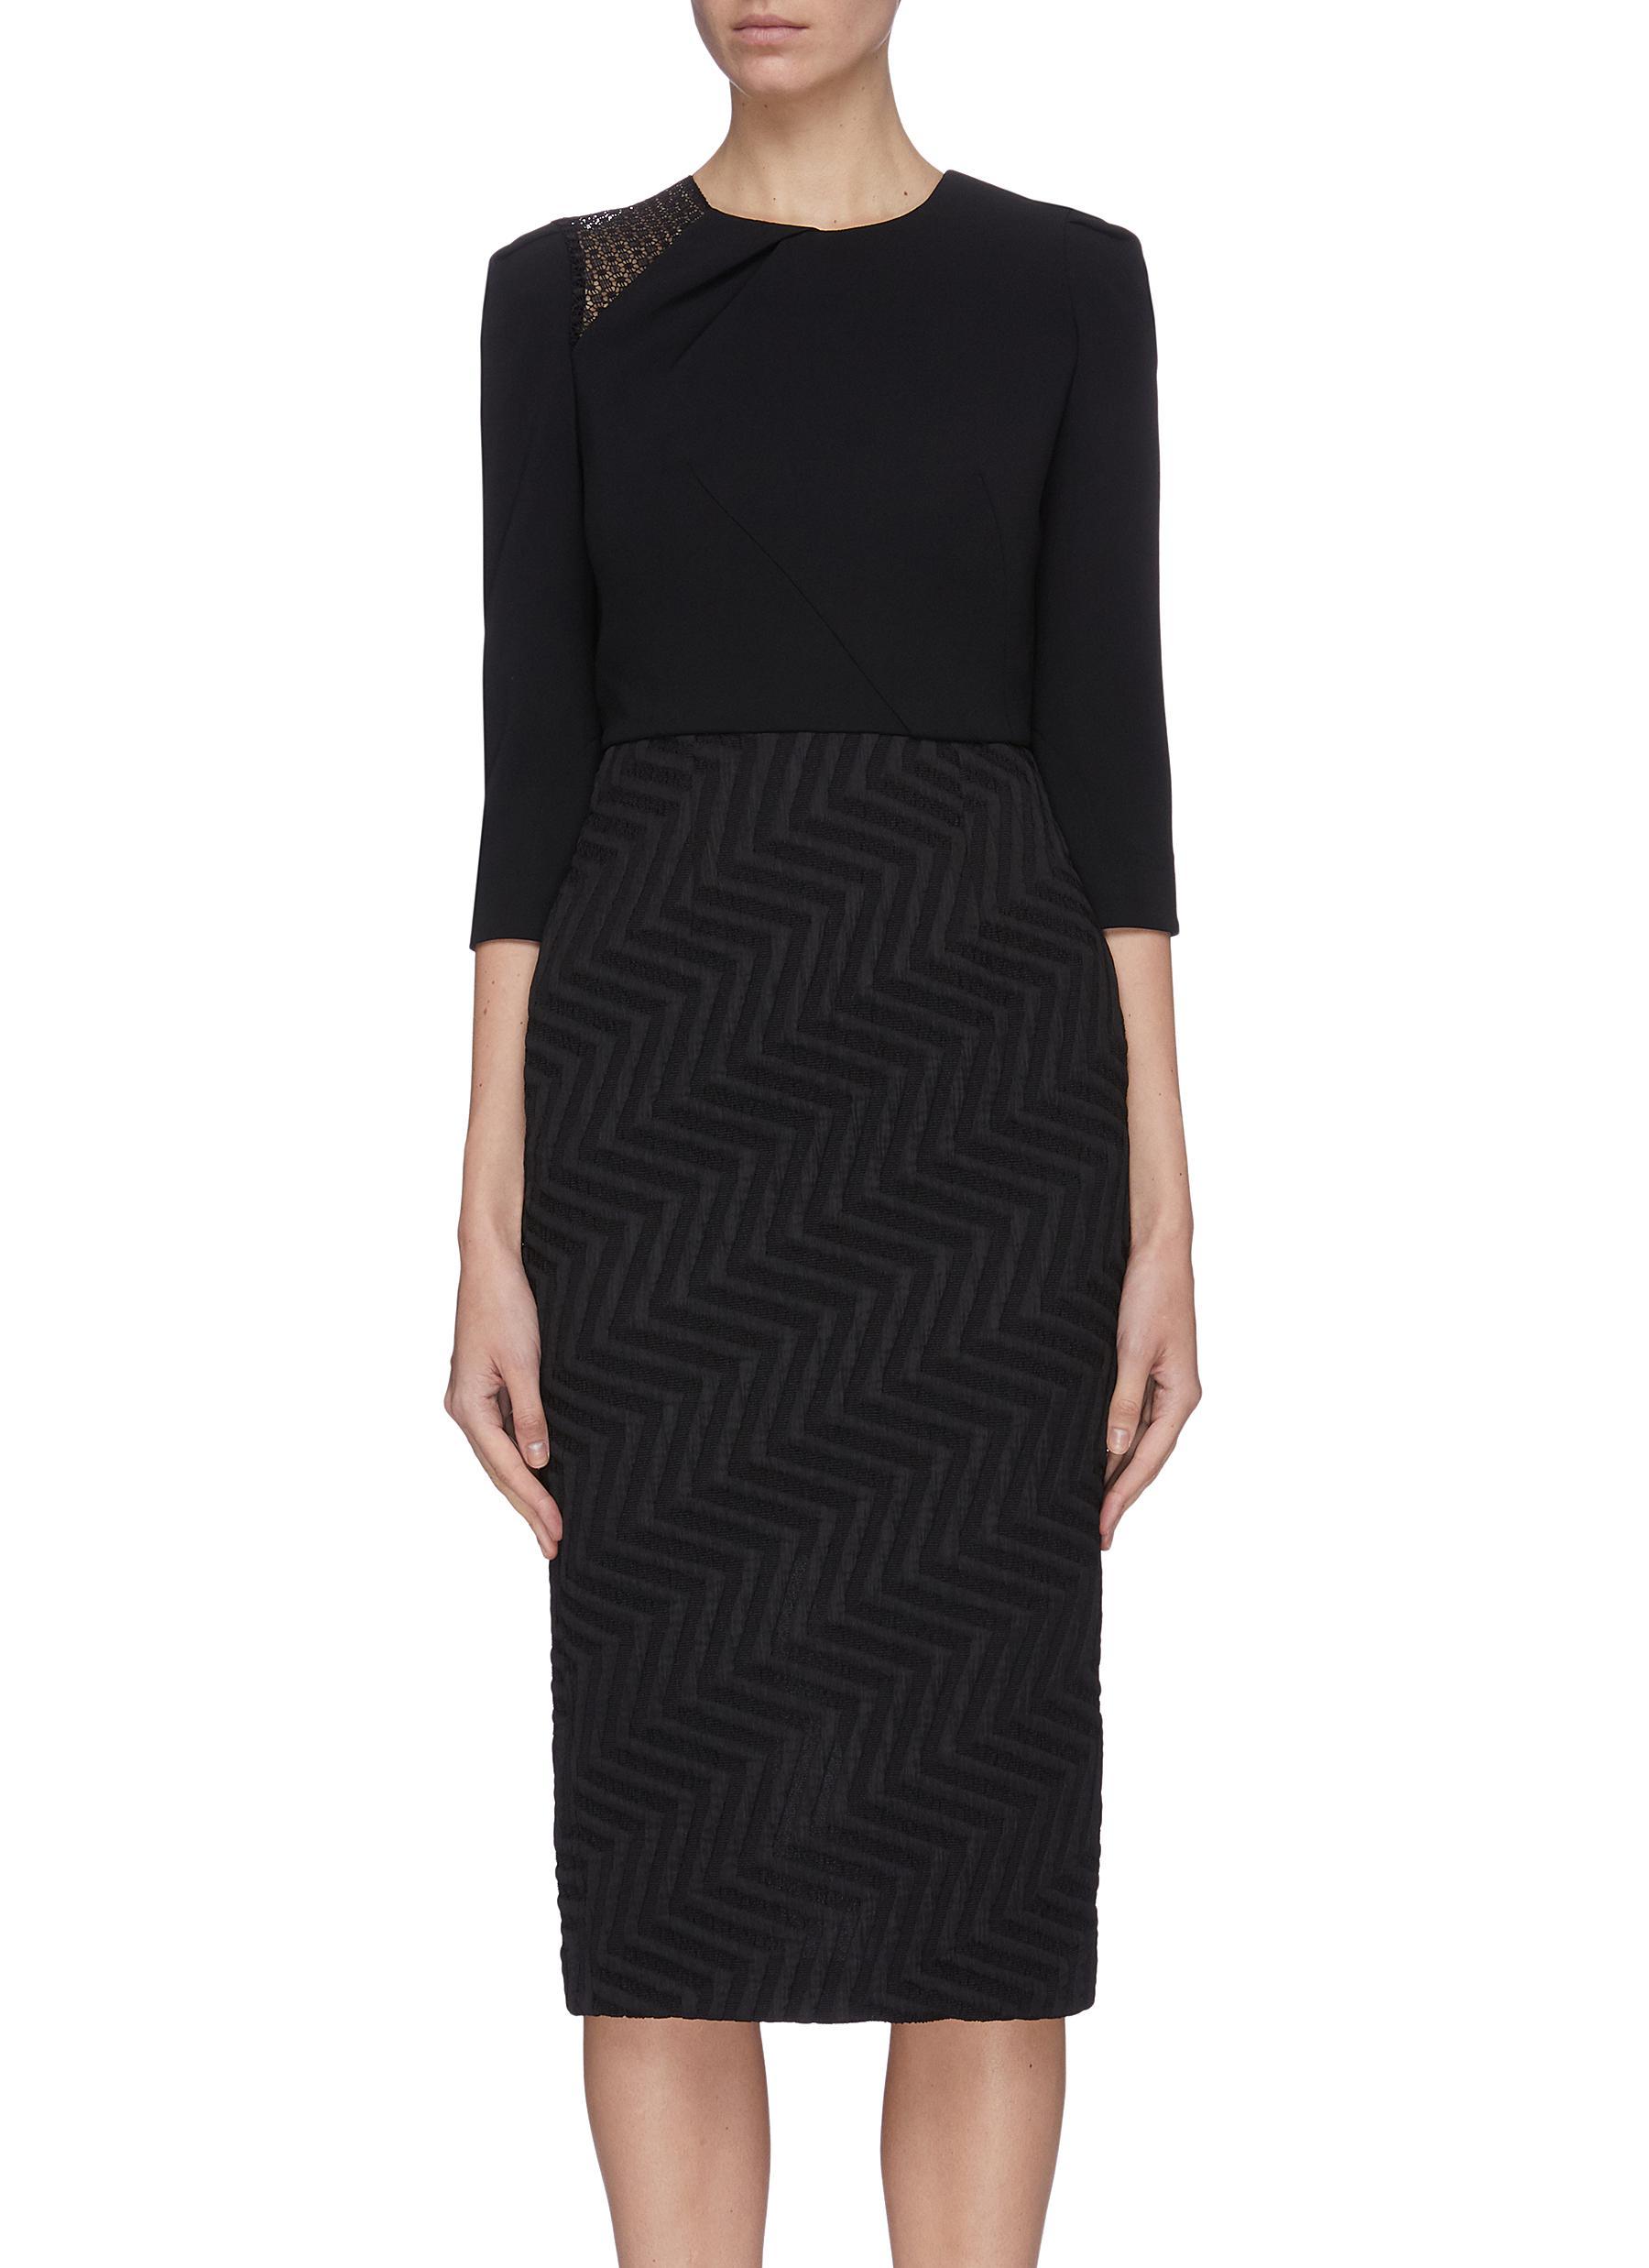 Buy Roland Mouret Dresses 'Palatine' chevron skirt lace panel dress